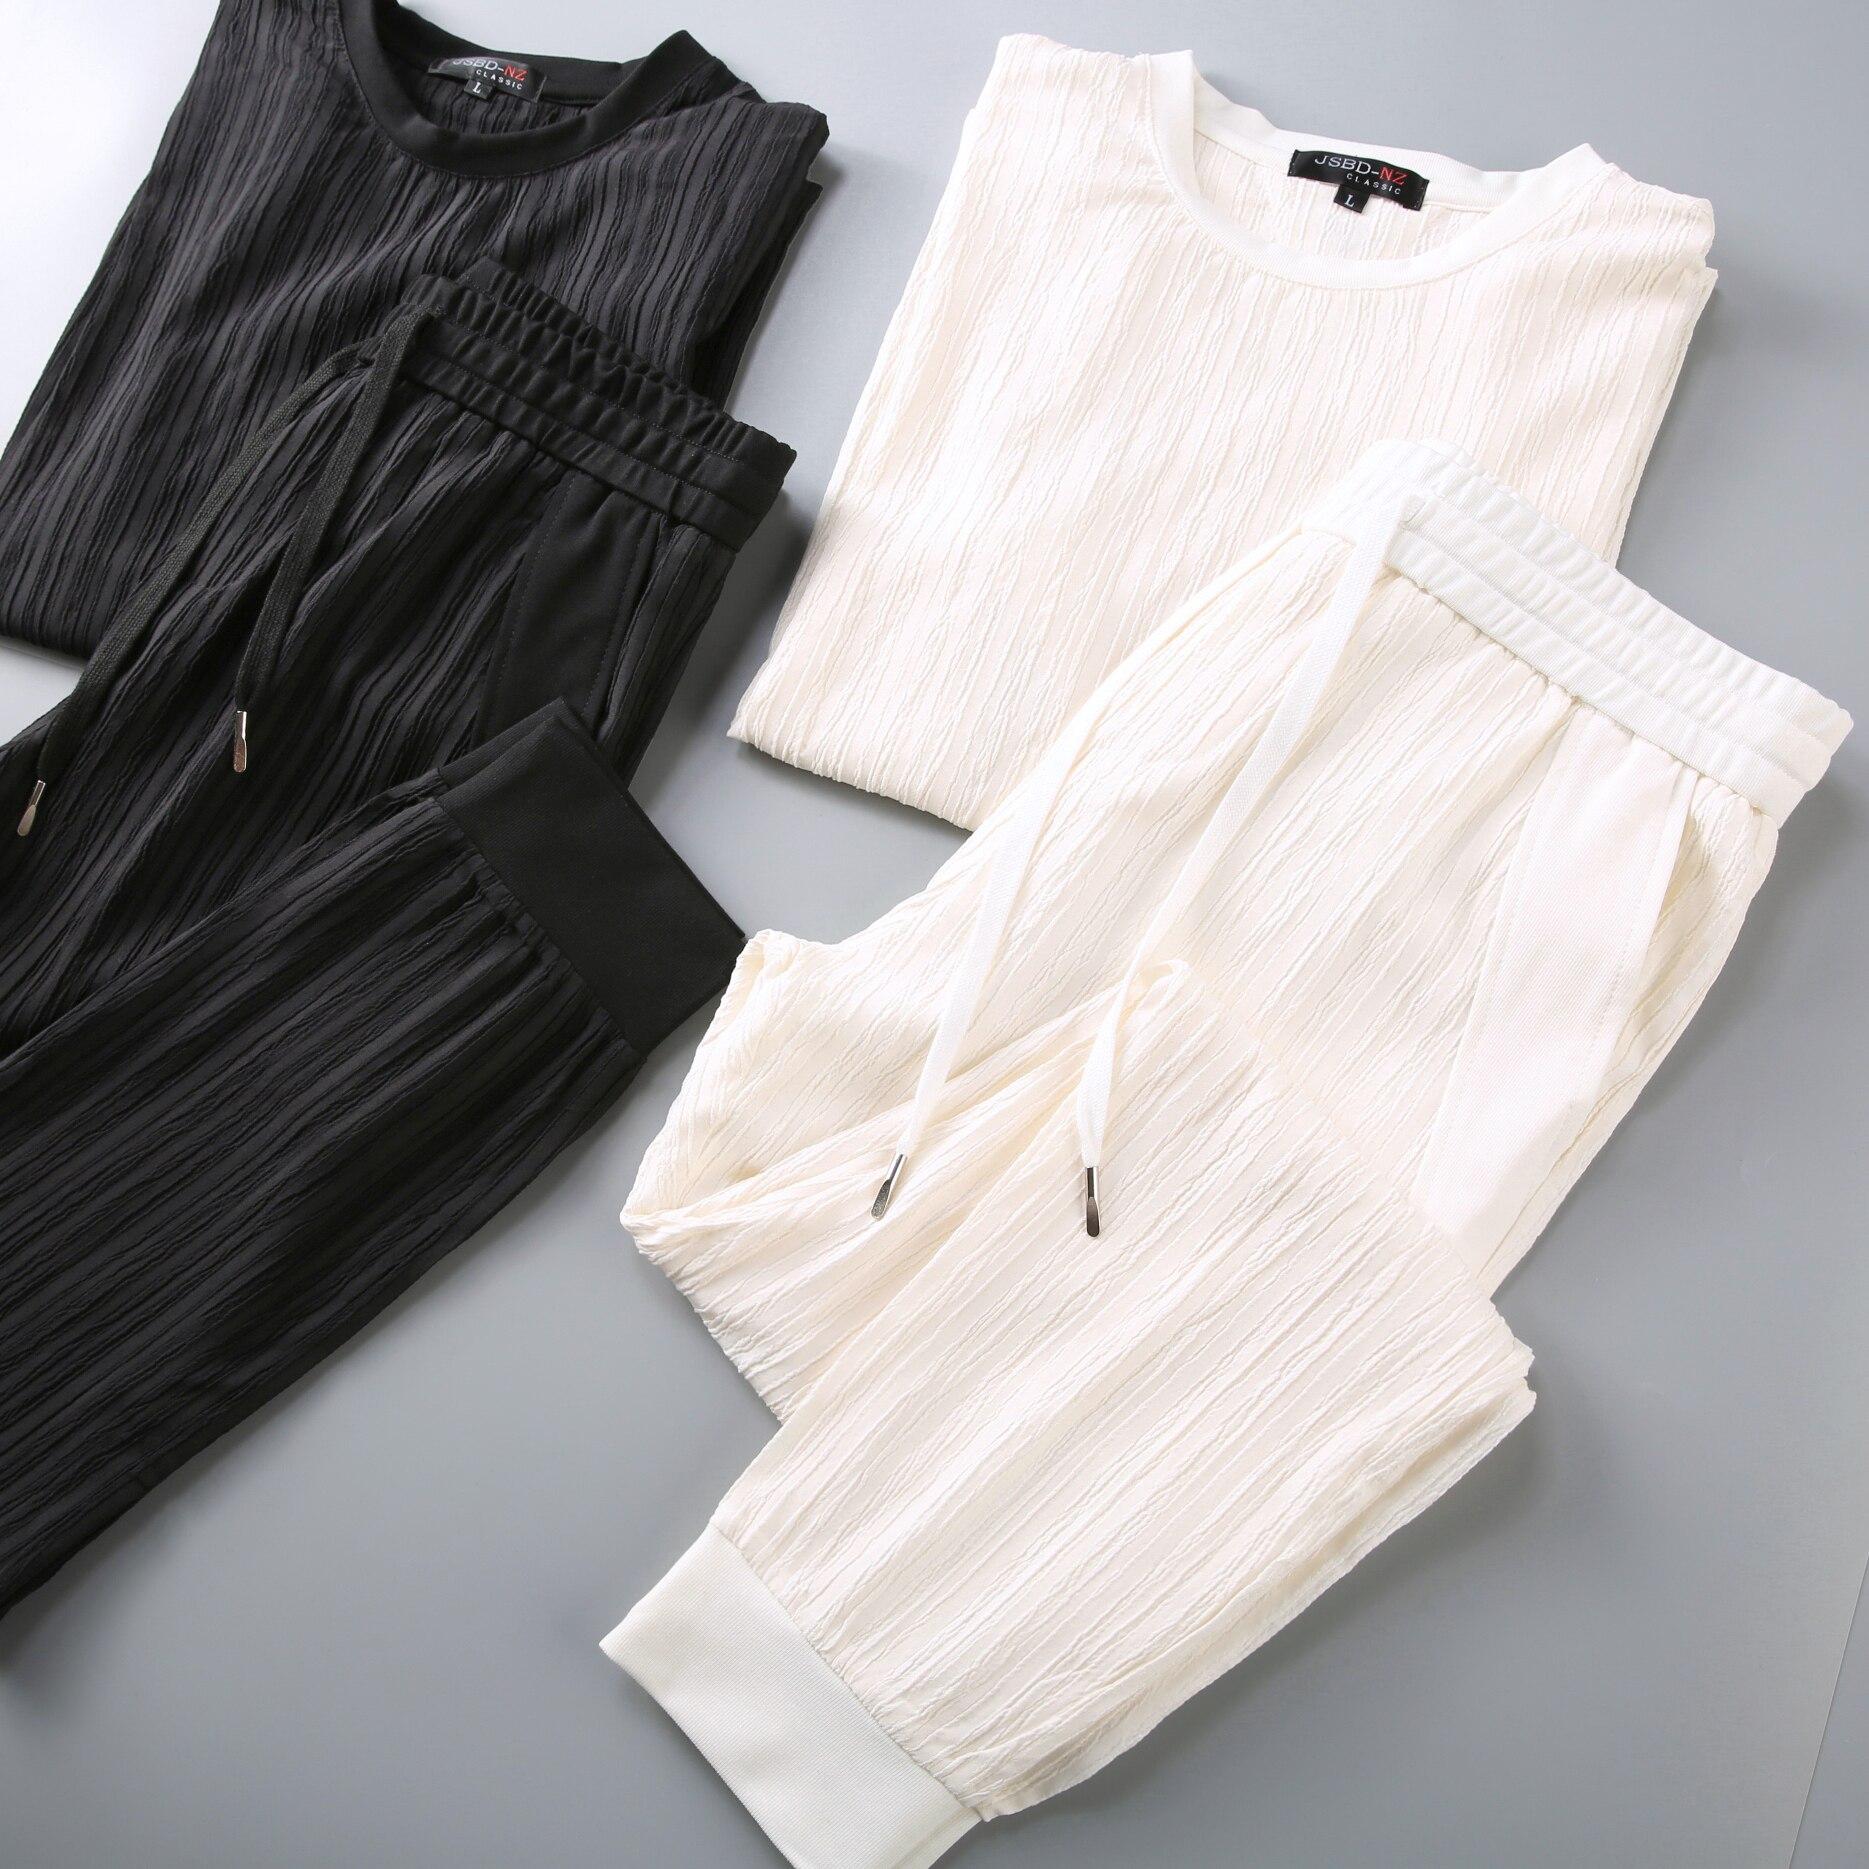 JSBD Summer Linen Set Men's Casual Short-sleeved T-shirt Men's Summer Cotton And Linen Chinese Style Thin Men's Fashion 2019 New